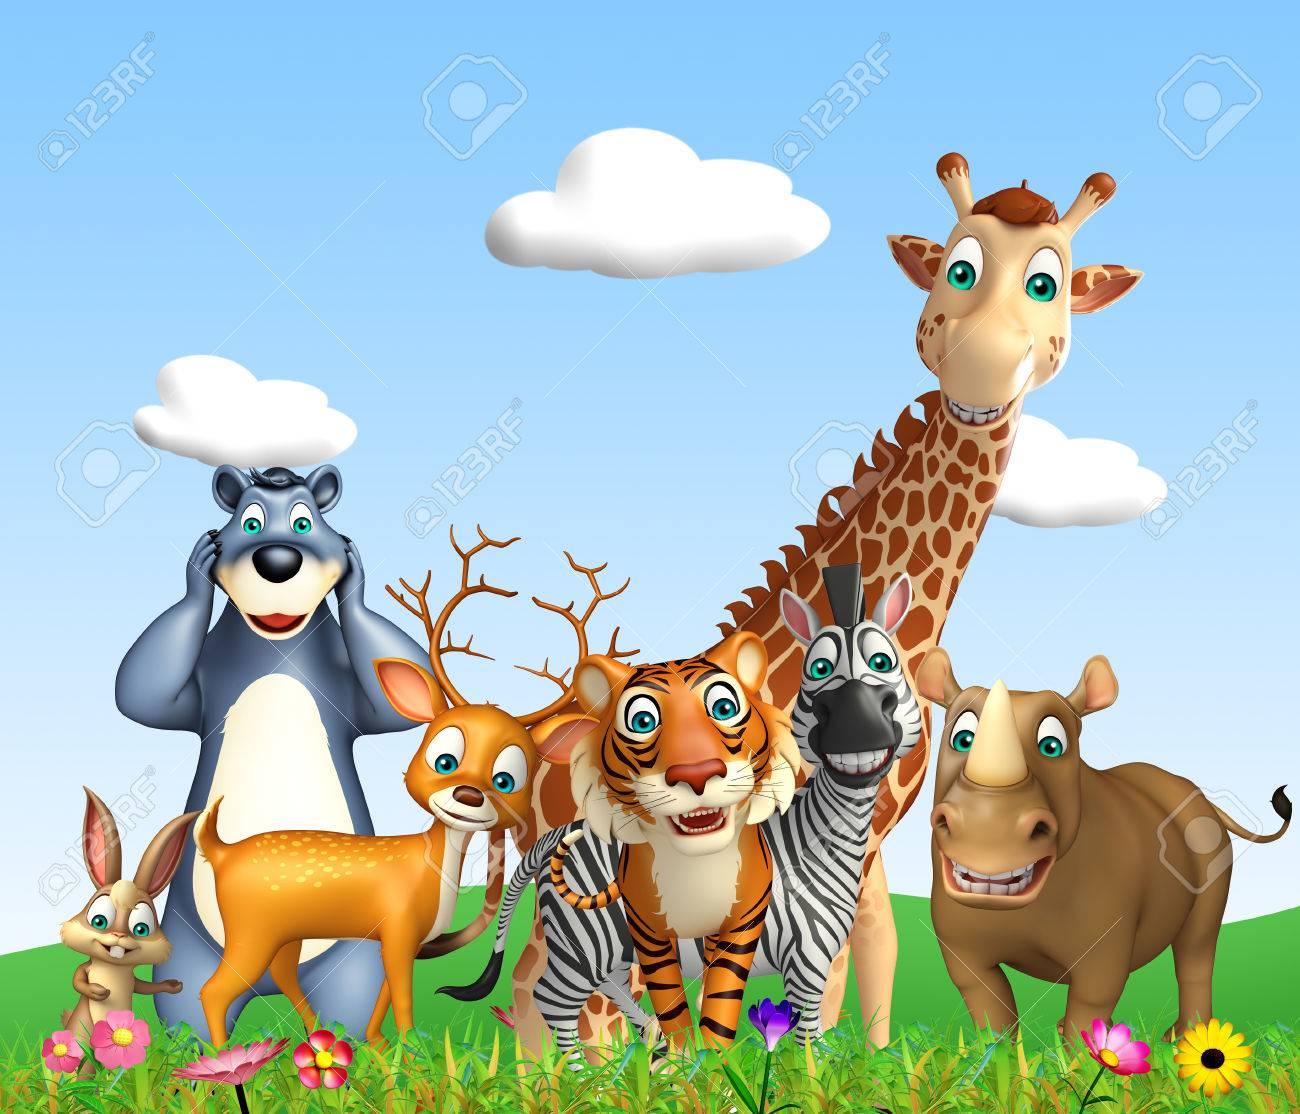 3d rendered illustration of wild animal - 53362917